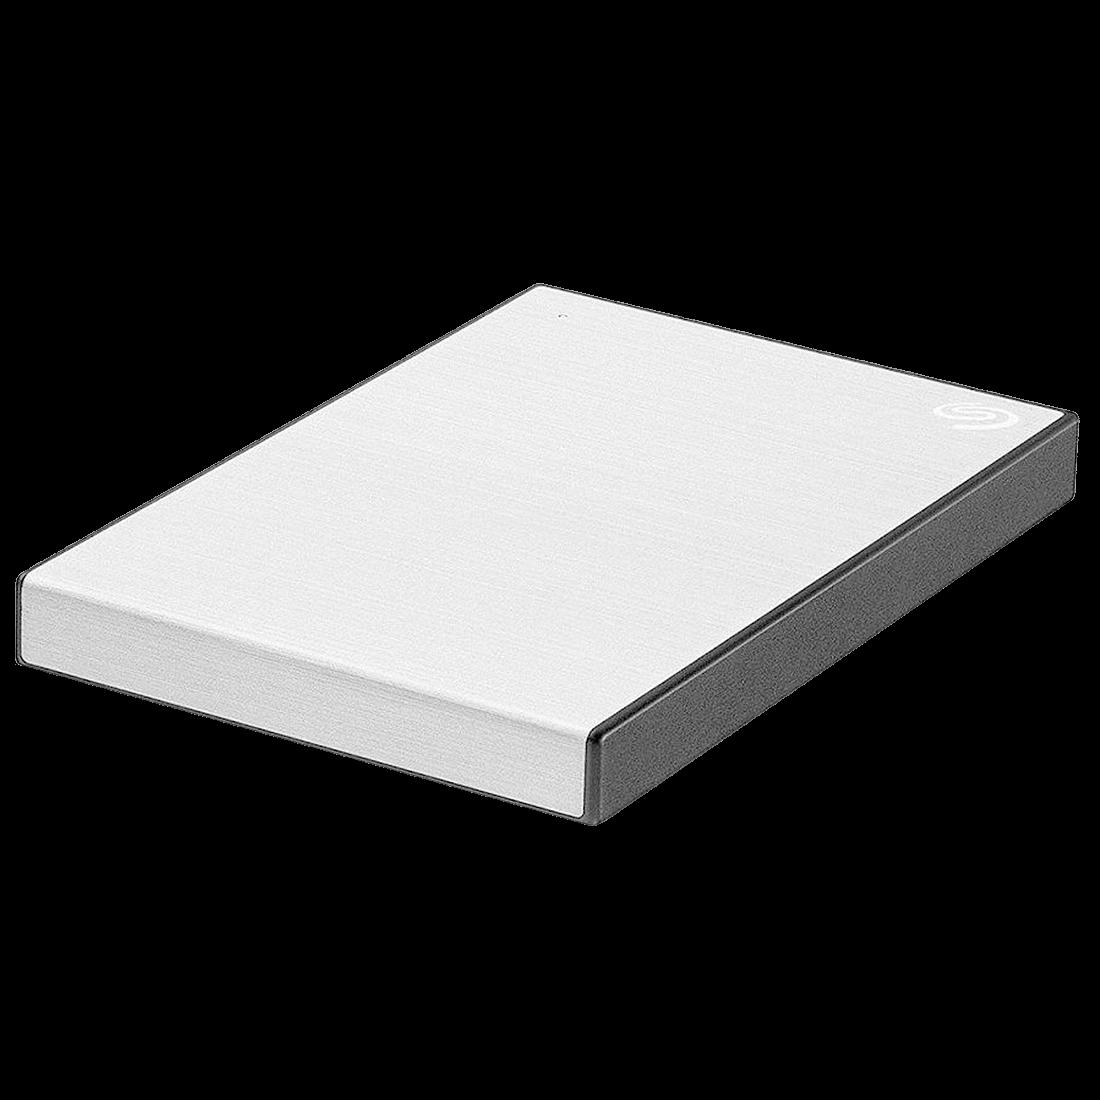 HD Externo Portátil 2TB Seagate Plus Slim - USB 3.0 - Prata - STHN2000401